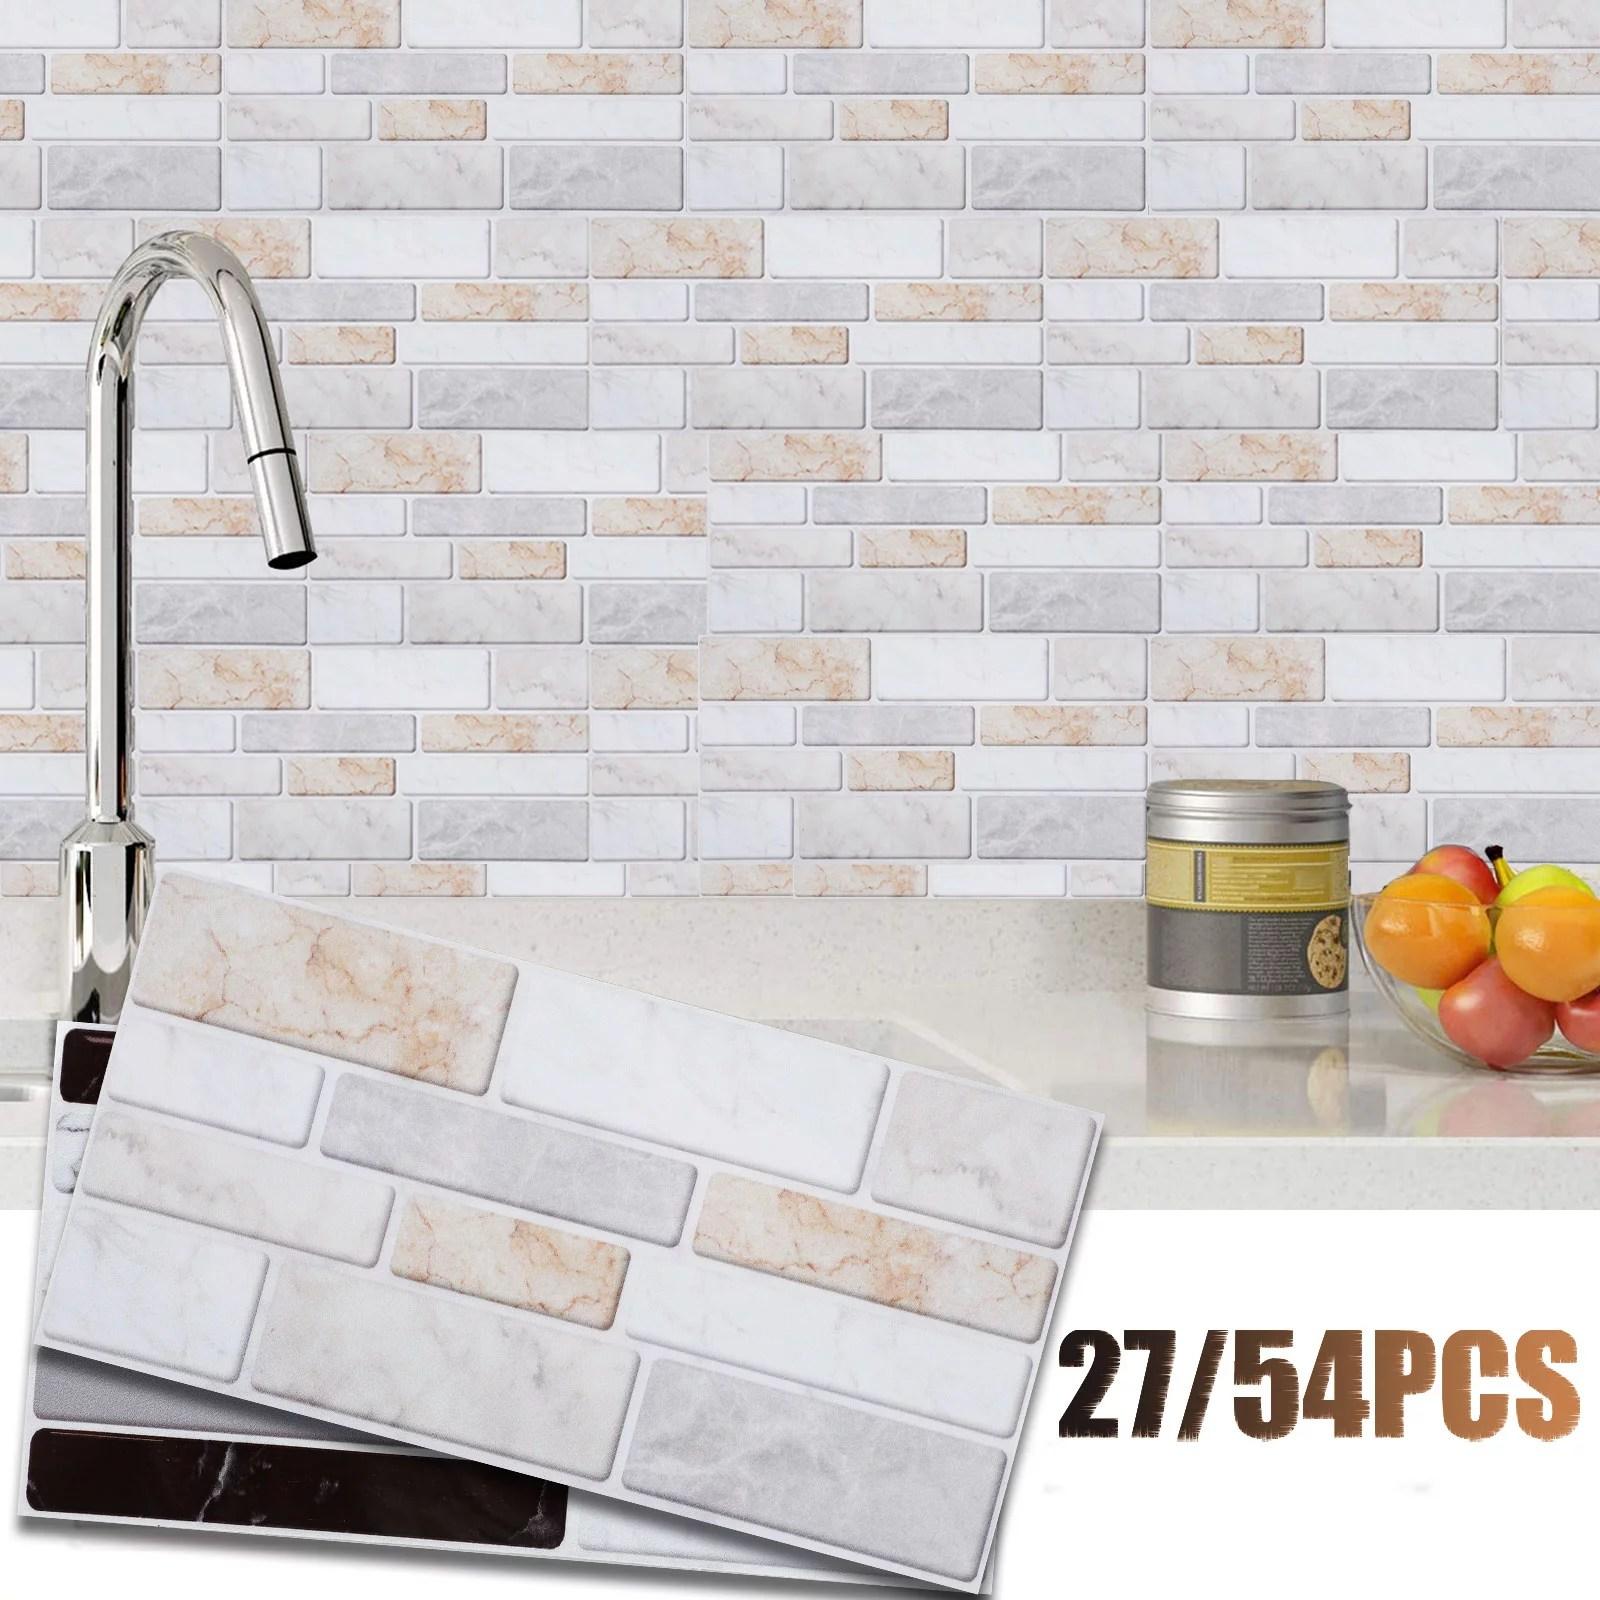 tsv 27 54pcs peel and stick backsplash wall tile 3d self adhesive removable wallpaper mosaic tile sticker for kitchen bathroom 3d wall sticker